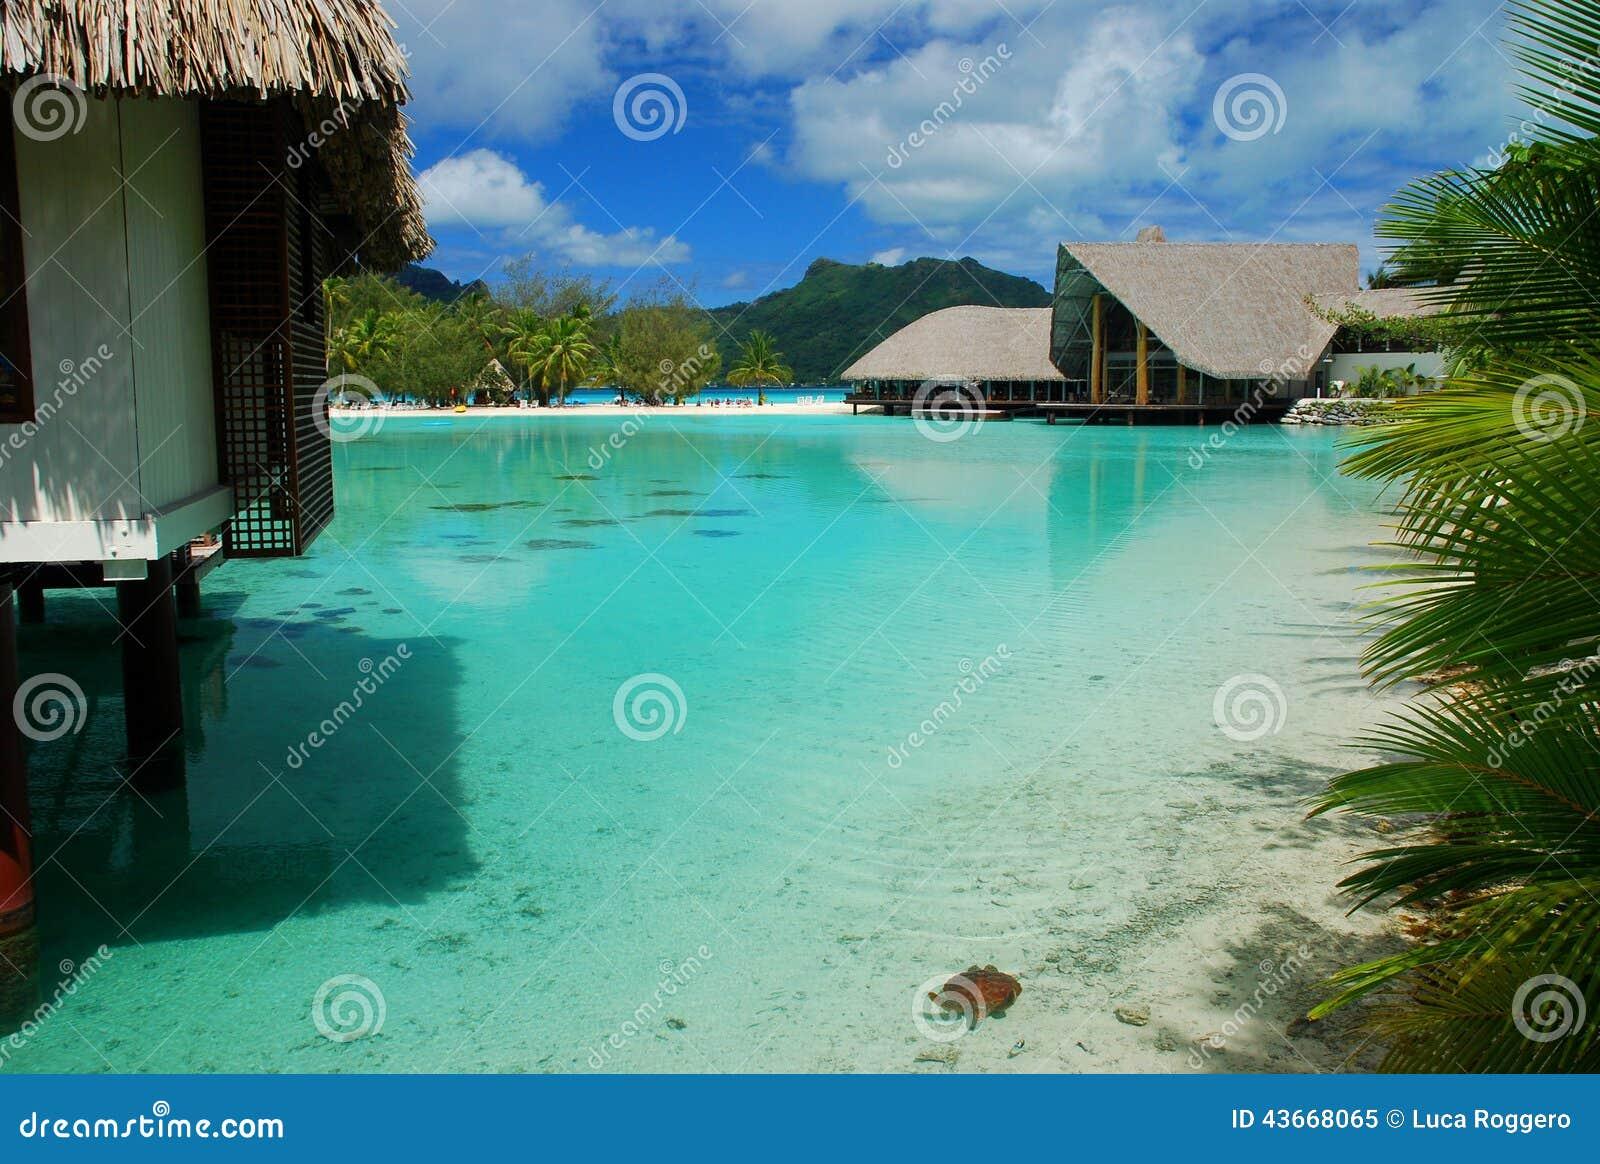 Ricorso turistico Bora Bora, Polinesia francese